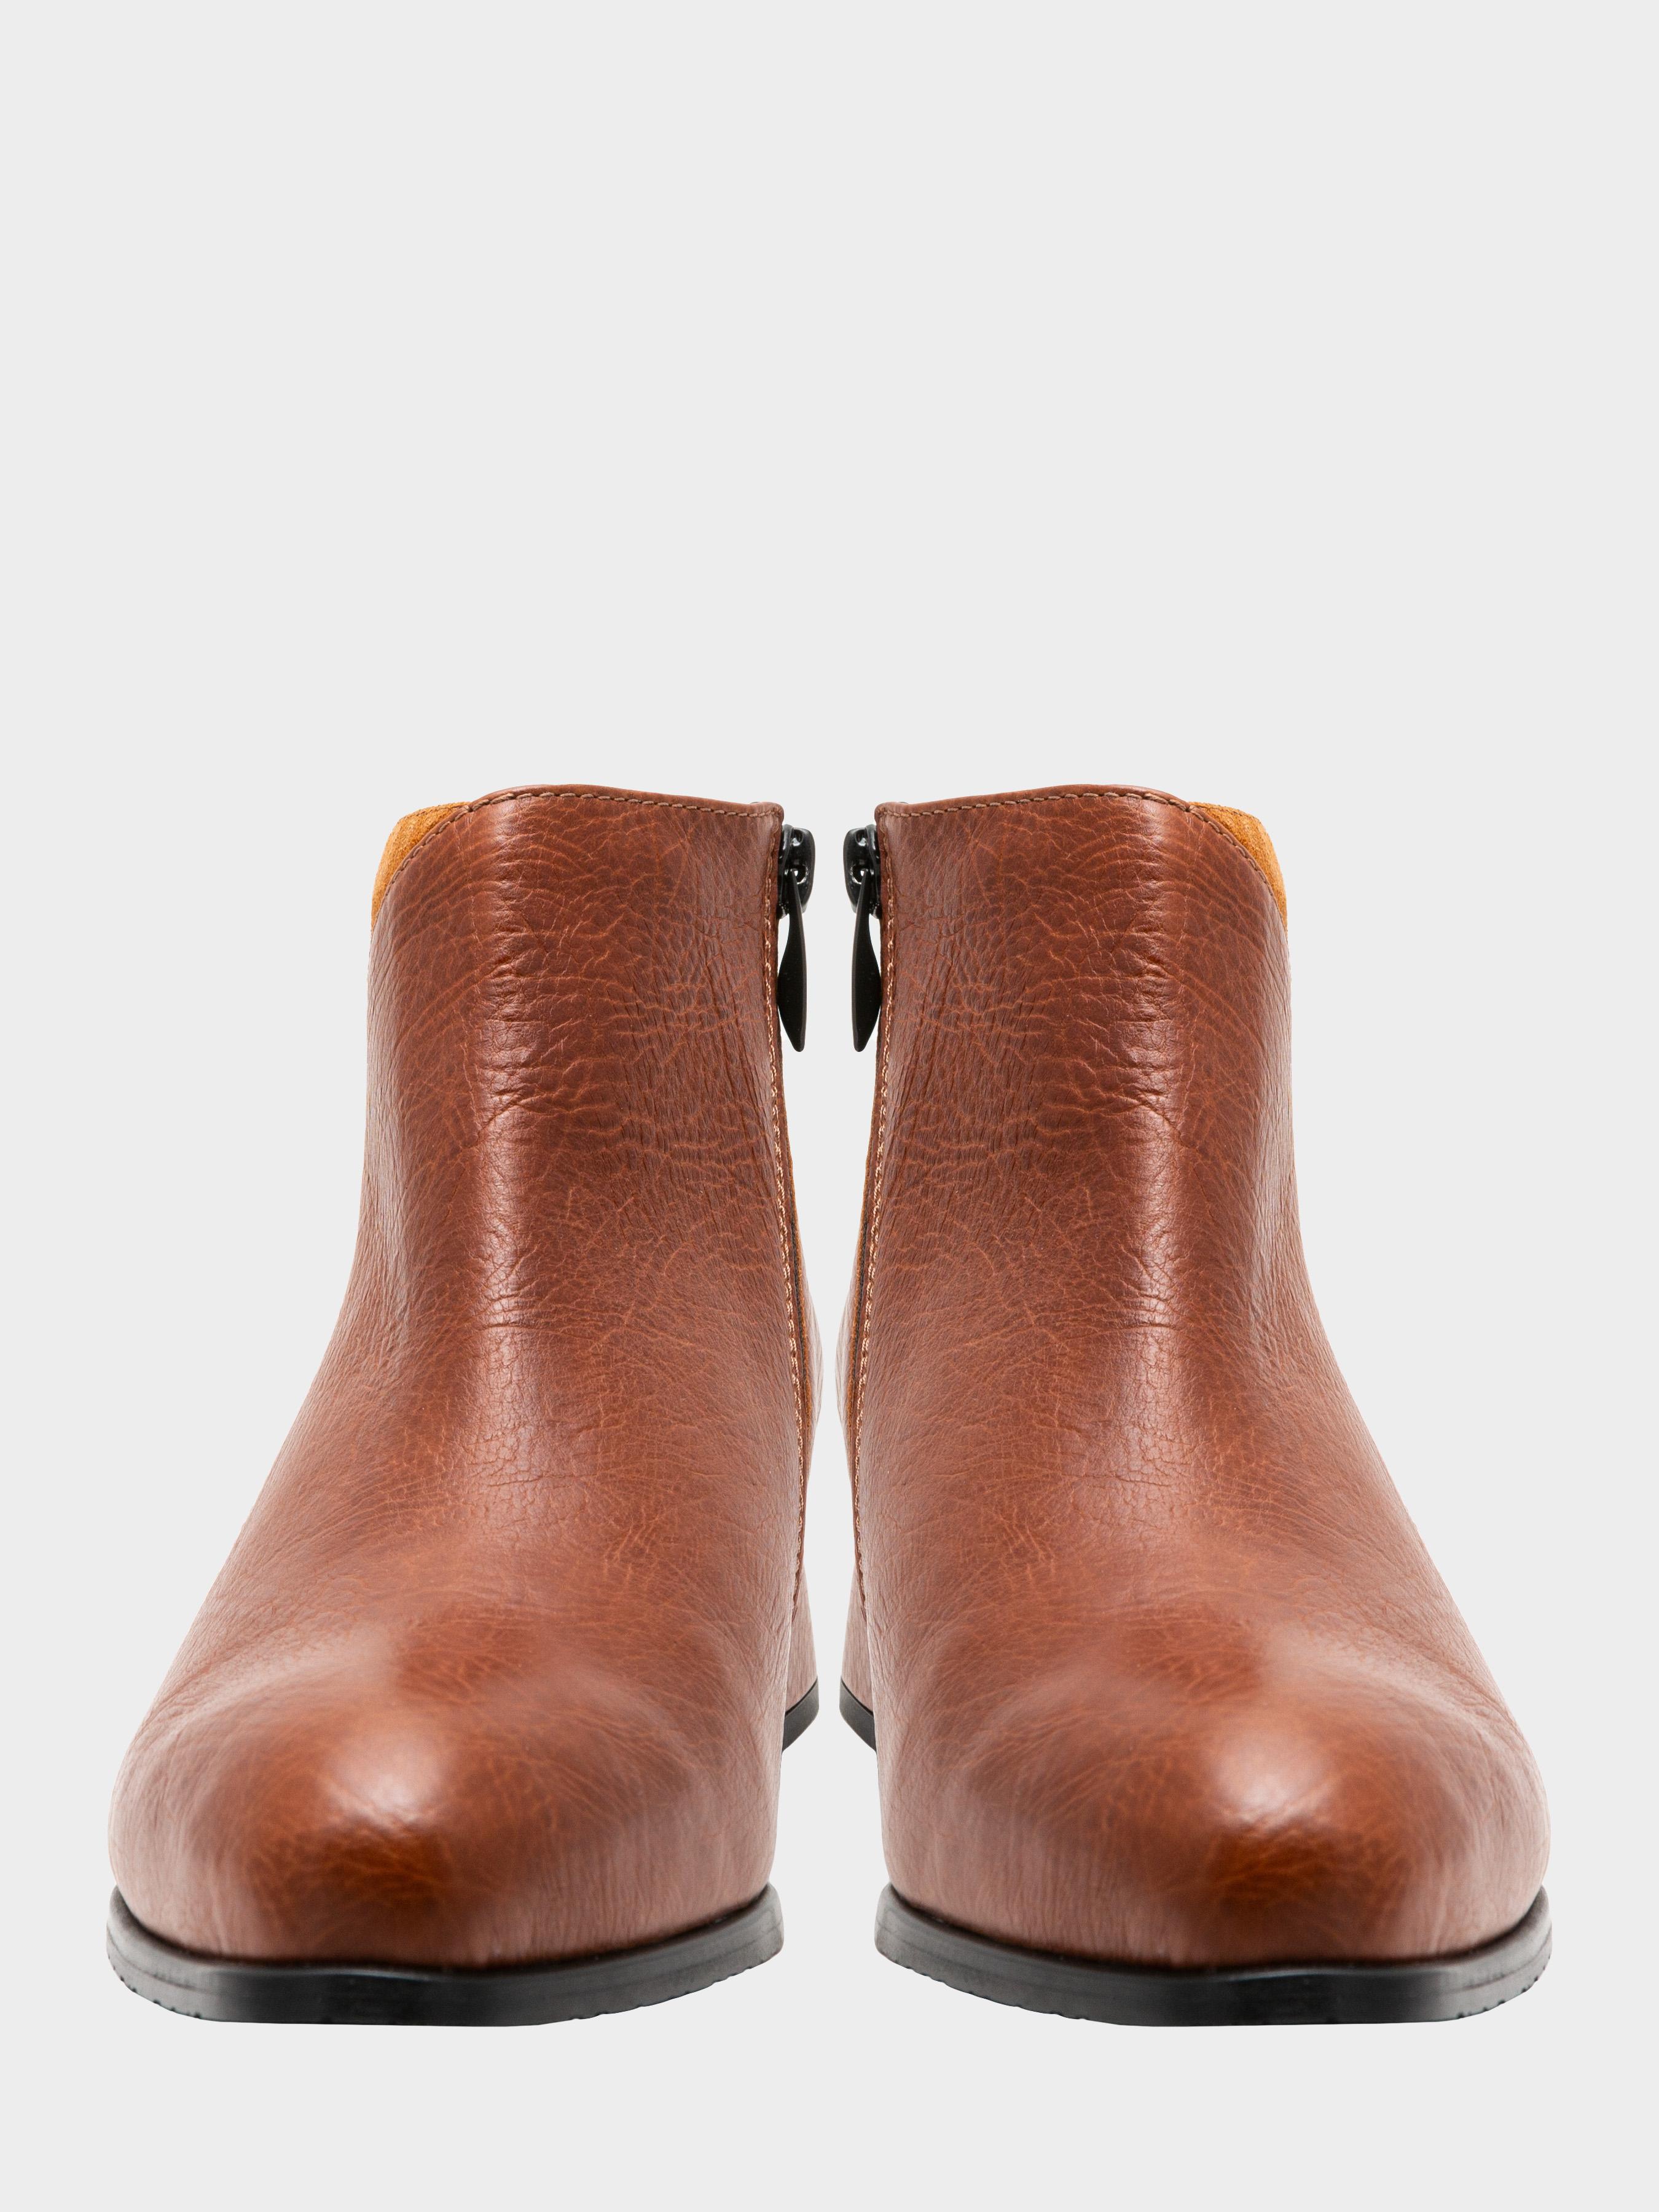 Ботинки для женщин Ботинки женские ENZO VERRATTI 18-10029-4br примерка, 2017